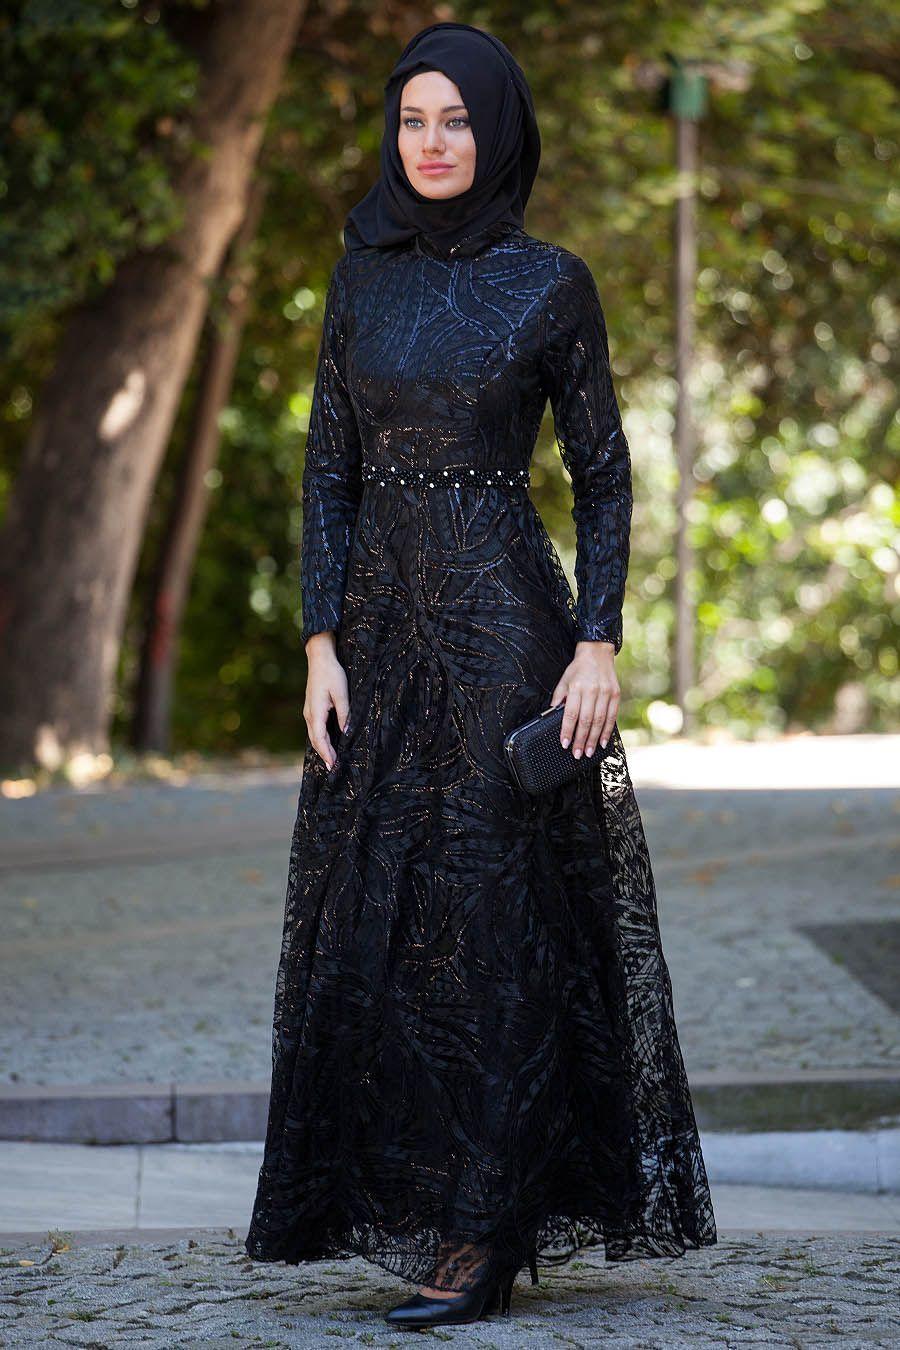 Tesetturlu Abiye Elbiseler Tesetturlu Abiye Elbise Tesettur Bayan Giyimde Elbise Ferace Esarp Sal H Model Pakaian Hijab Pakaian Wanita Model Pakaian Muslim